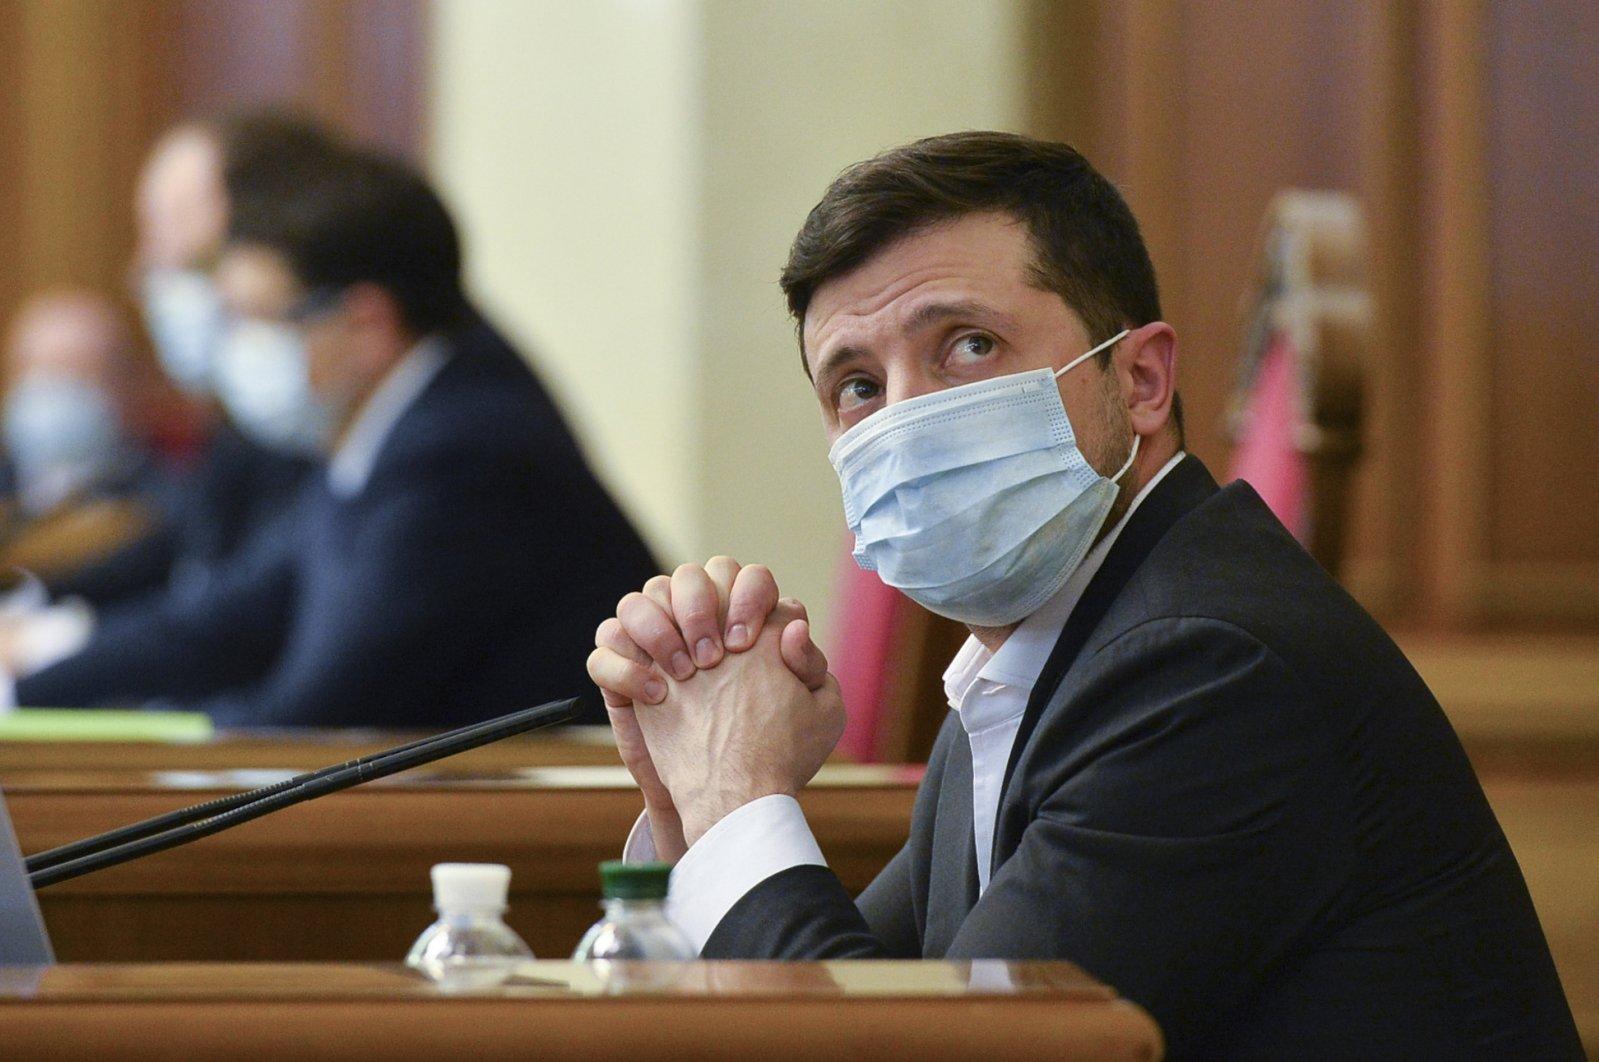 Ukrainian President Volodymyr Zelenskiy wears a mask to protect against the coronavirus during an extraordinary parliamentary session, Kiev, Ukraine, March 31, 2020. (AP Photo)